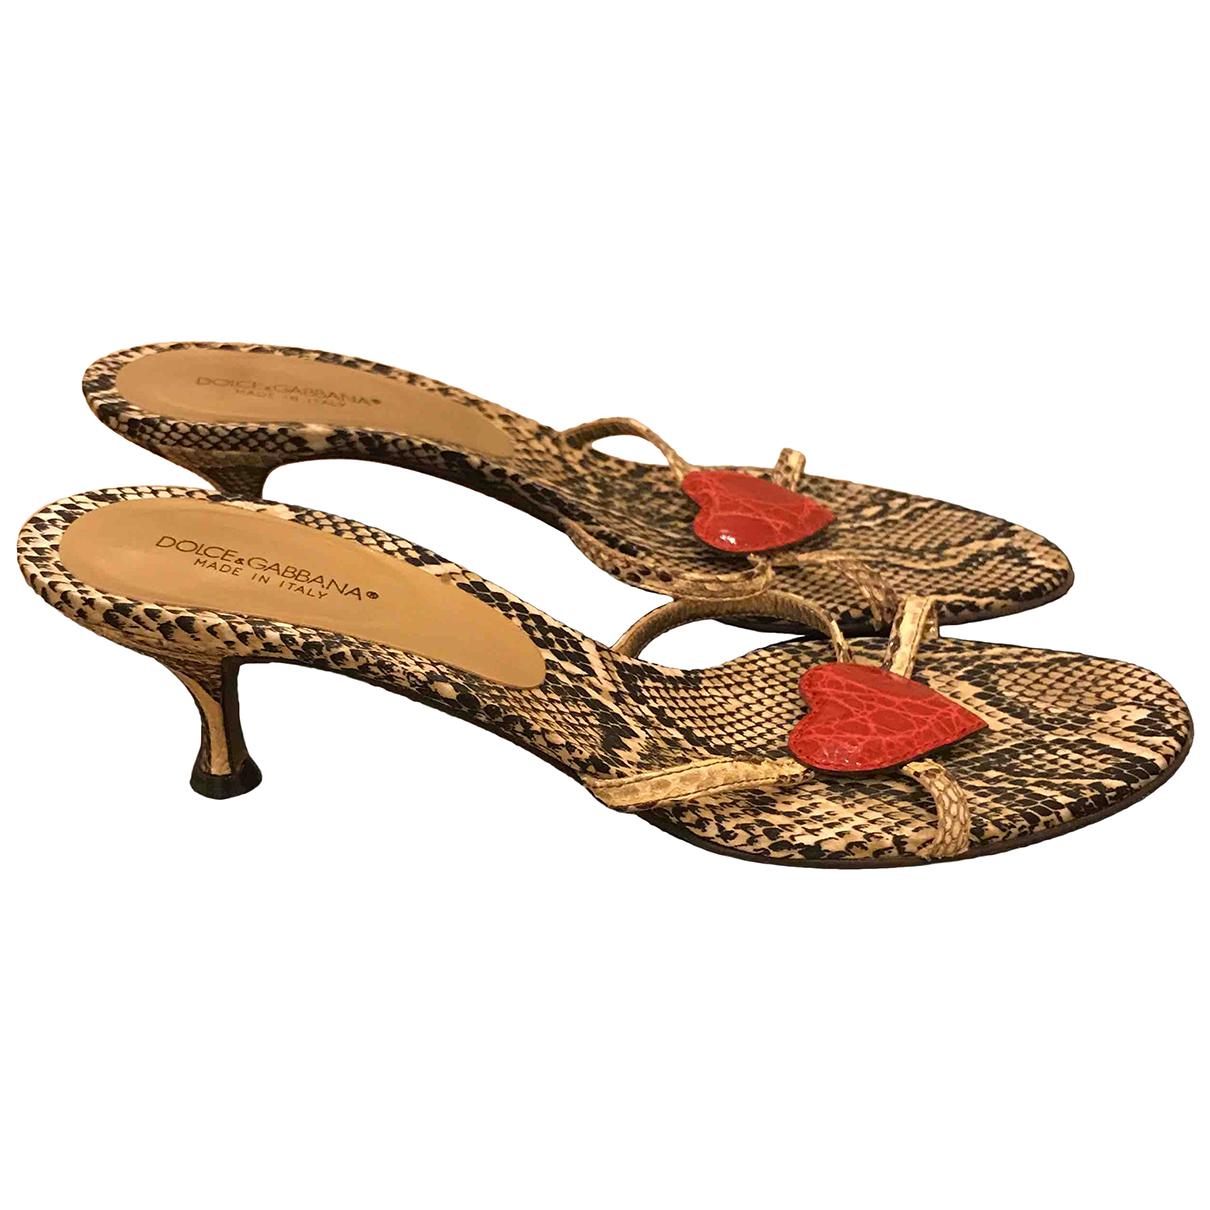 Dolce & Gabbana \N Sandalen in  Beige Exotenleder